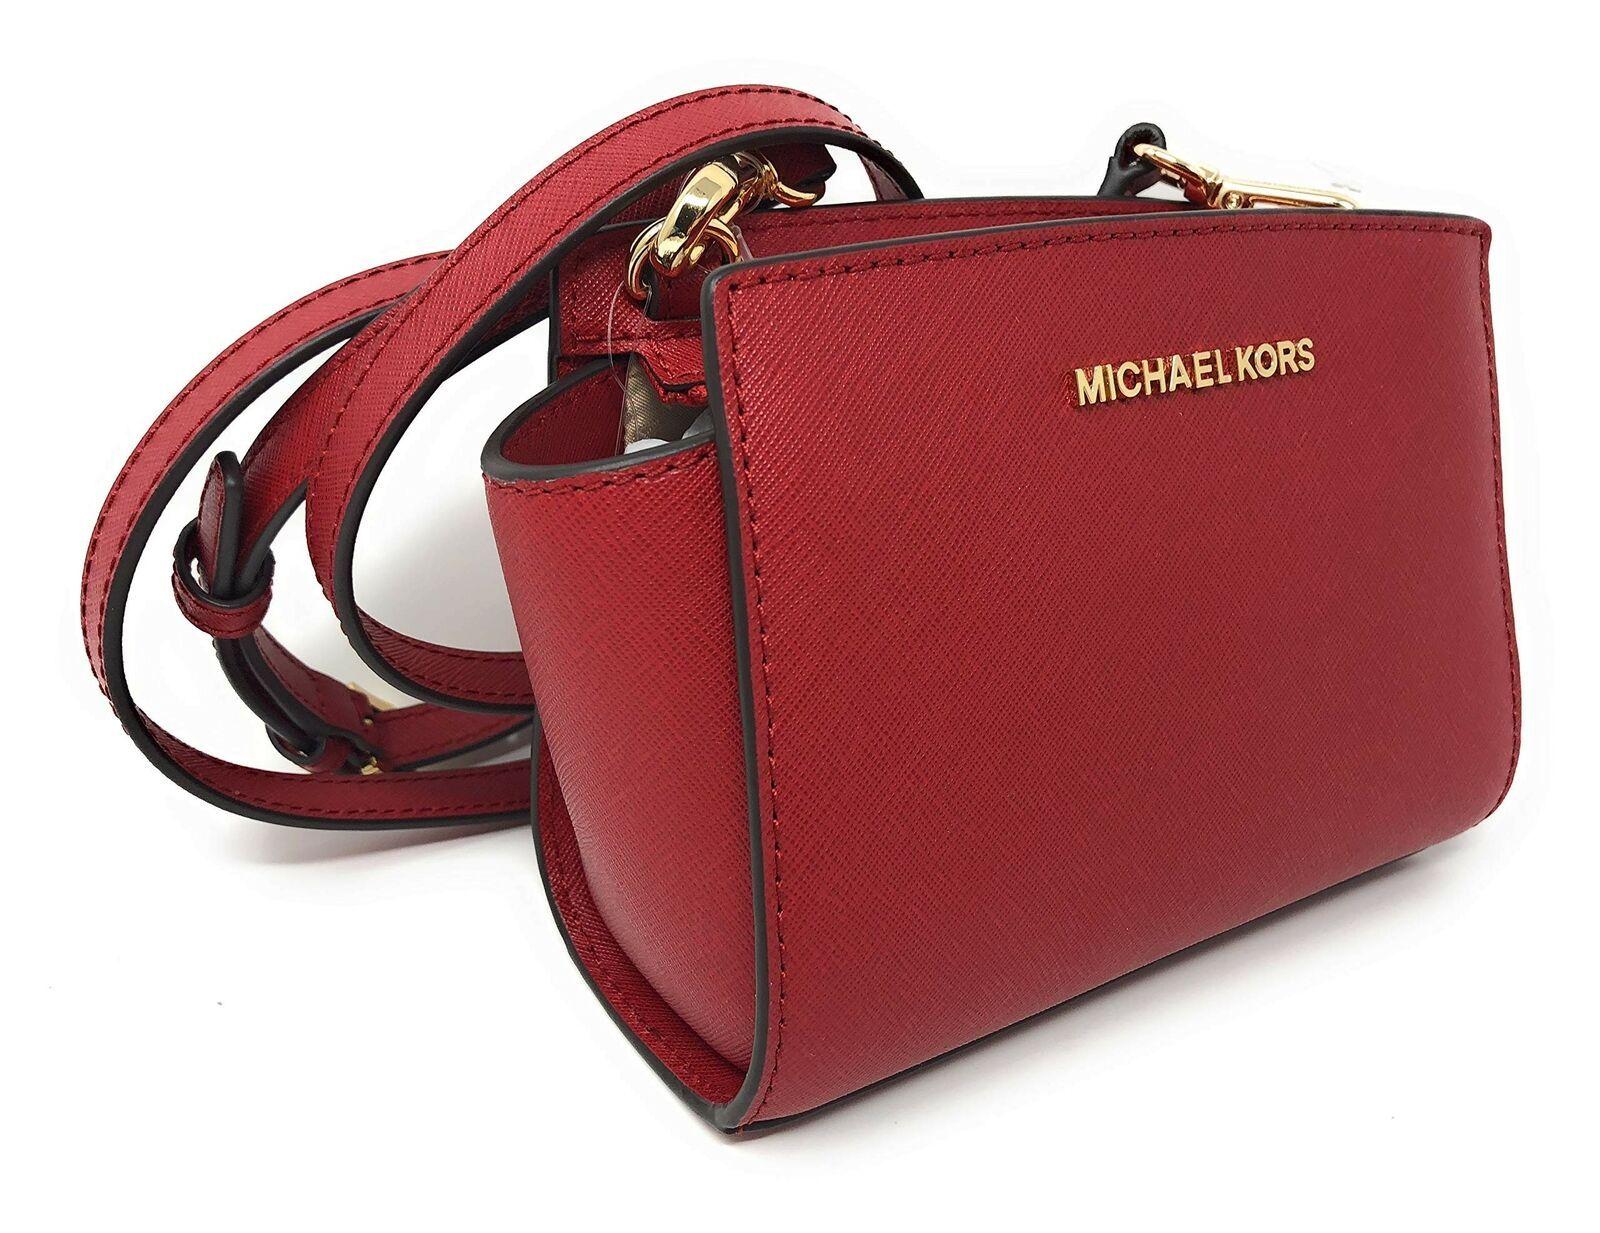 Michael Kors Selma Mini Saffiano Leather Crossbody Bag in Scarlet